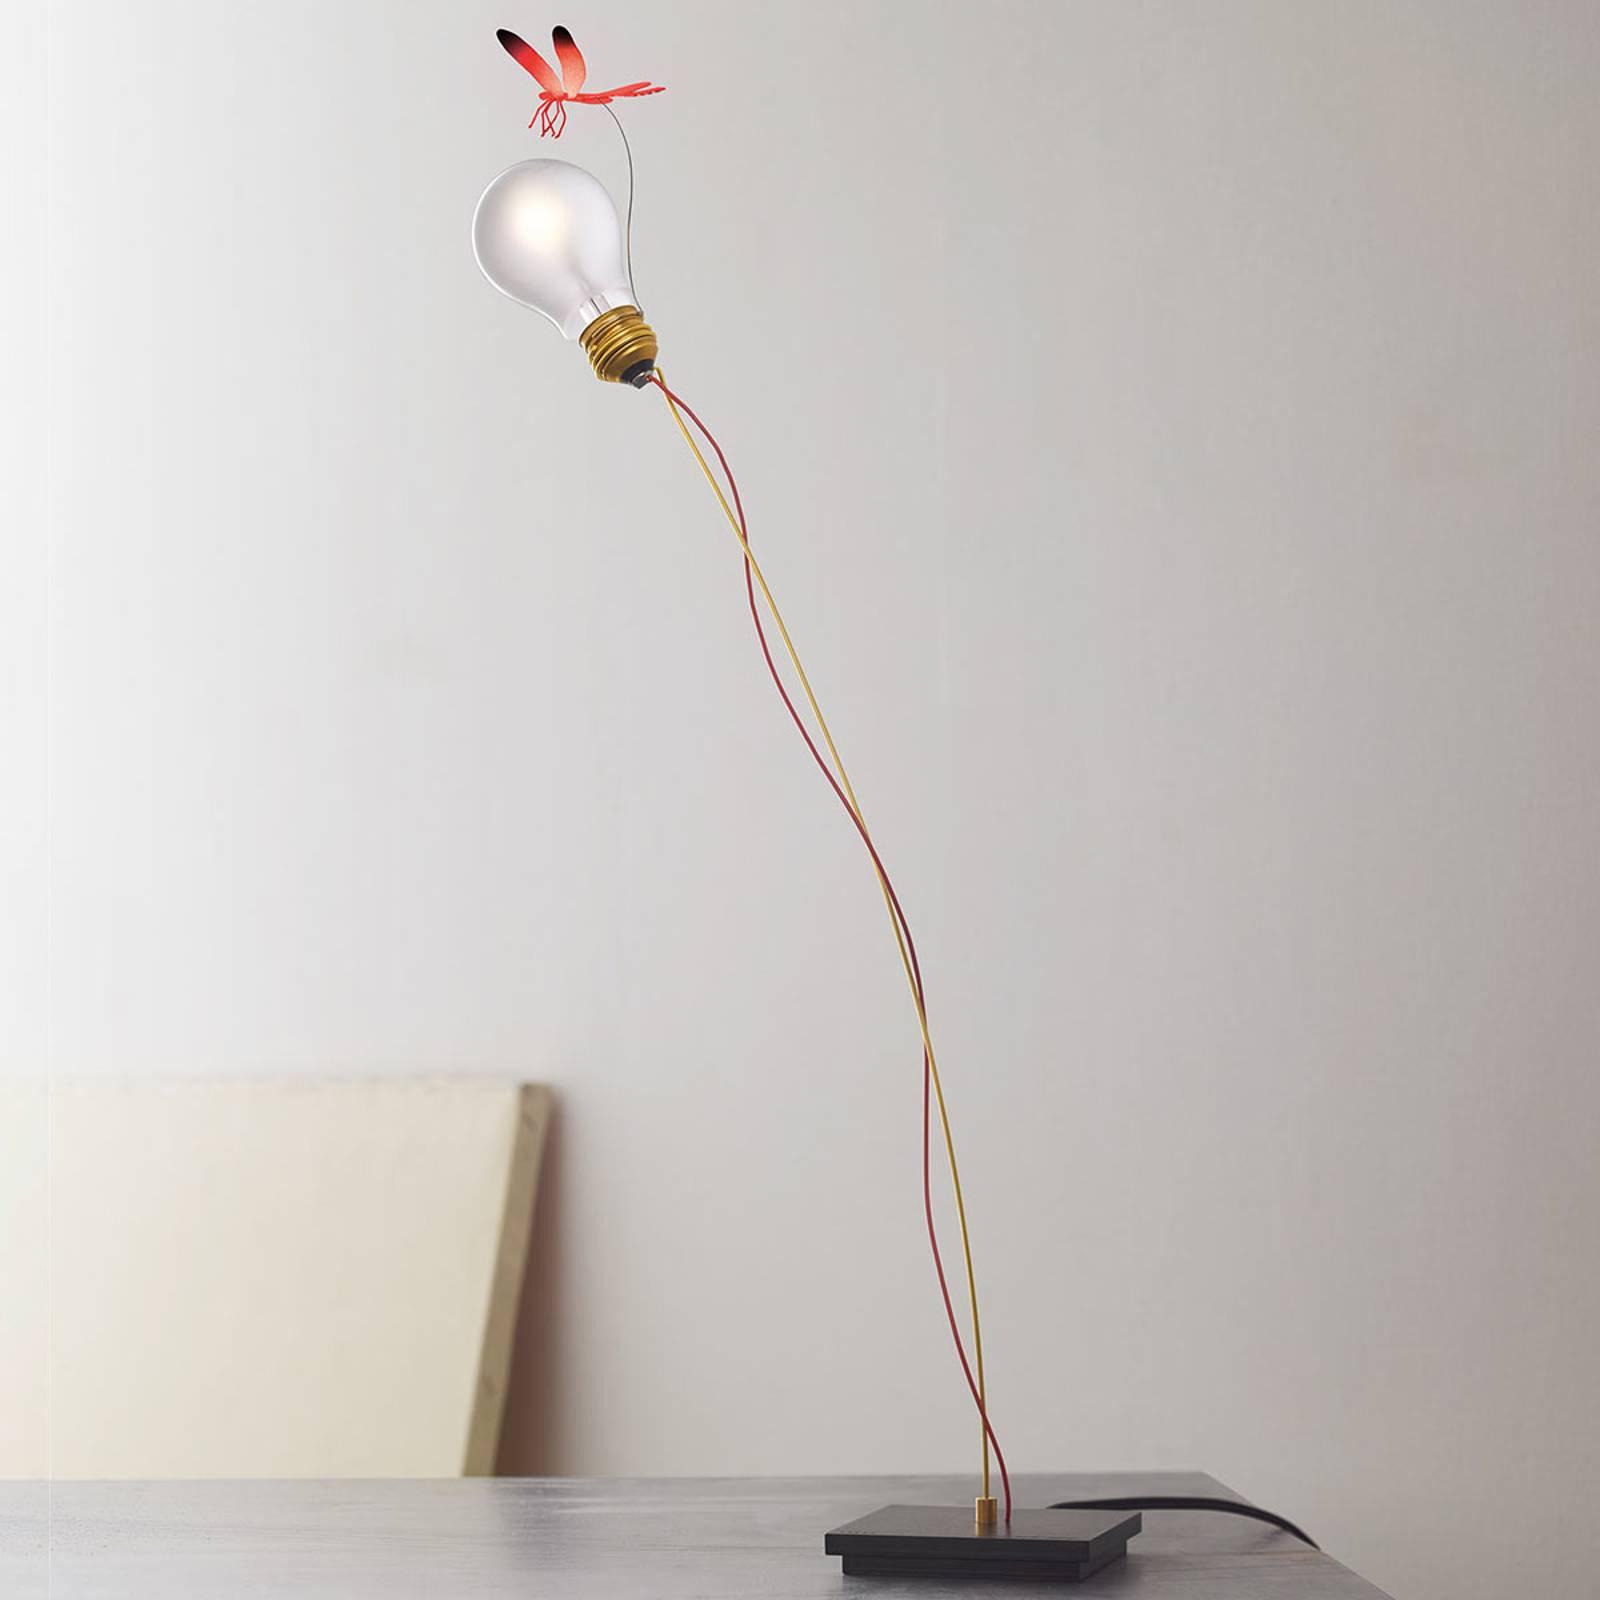 Bordlampe I Ricchi Poveri Bzzzz - rød libelle